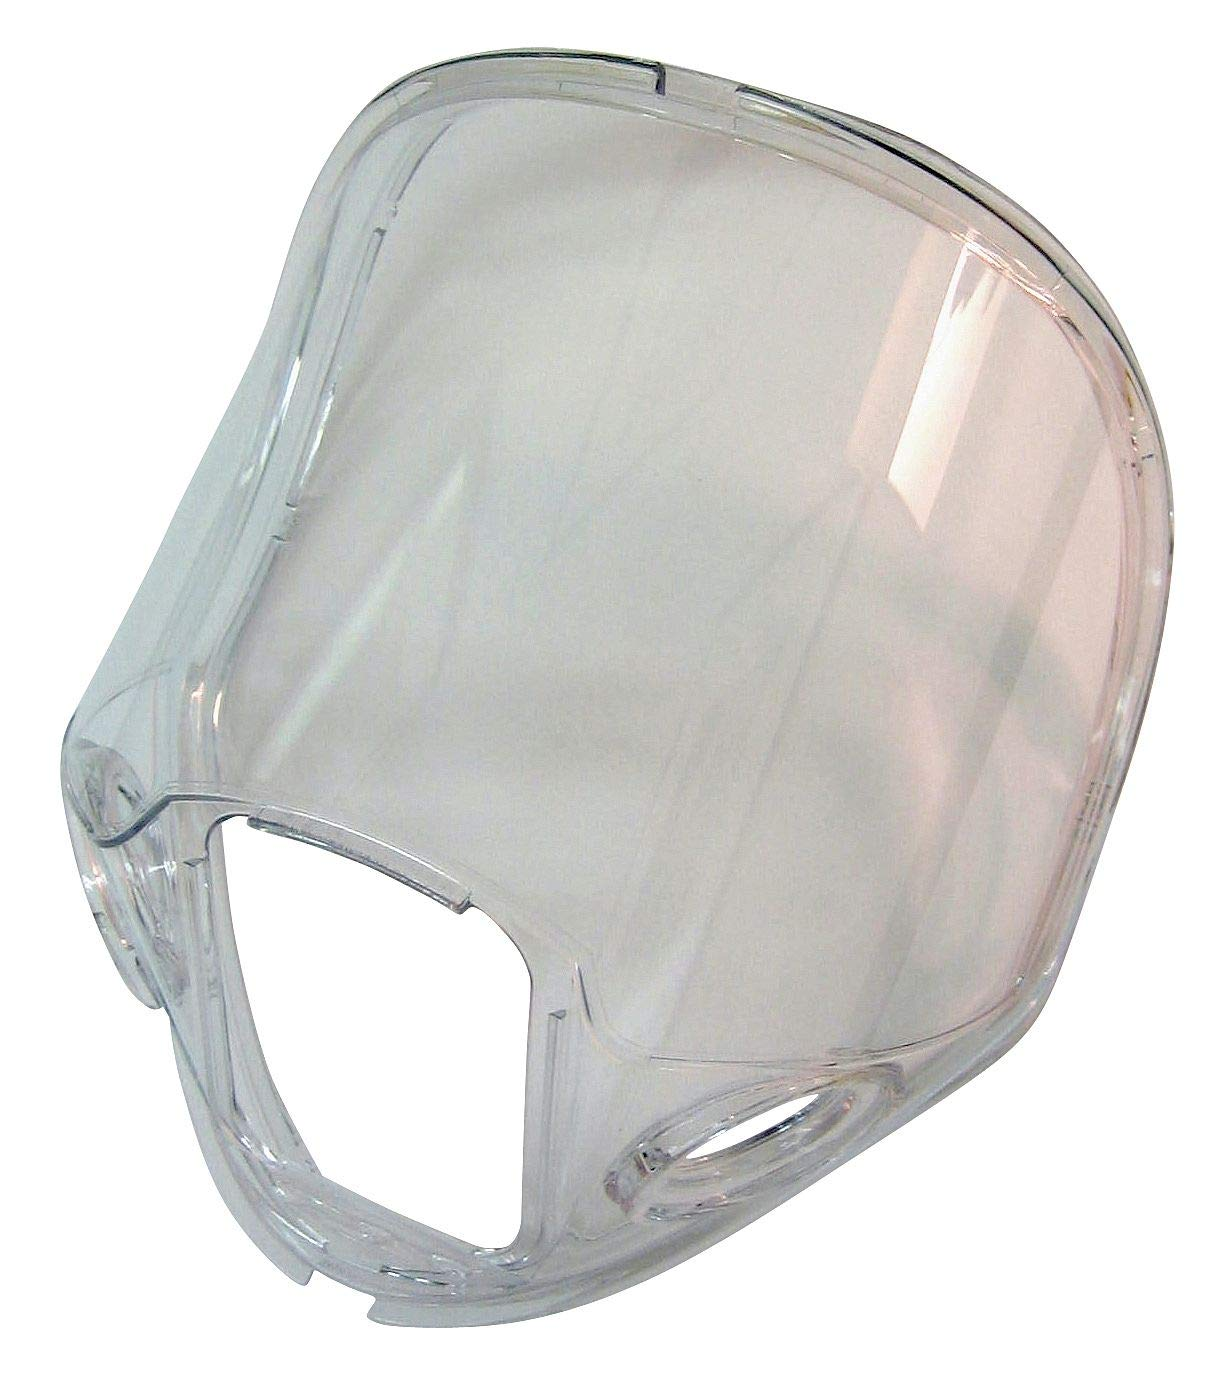 Allegro Respirator Lens - 9901-09L by Allegro